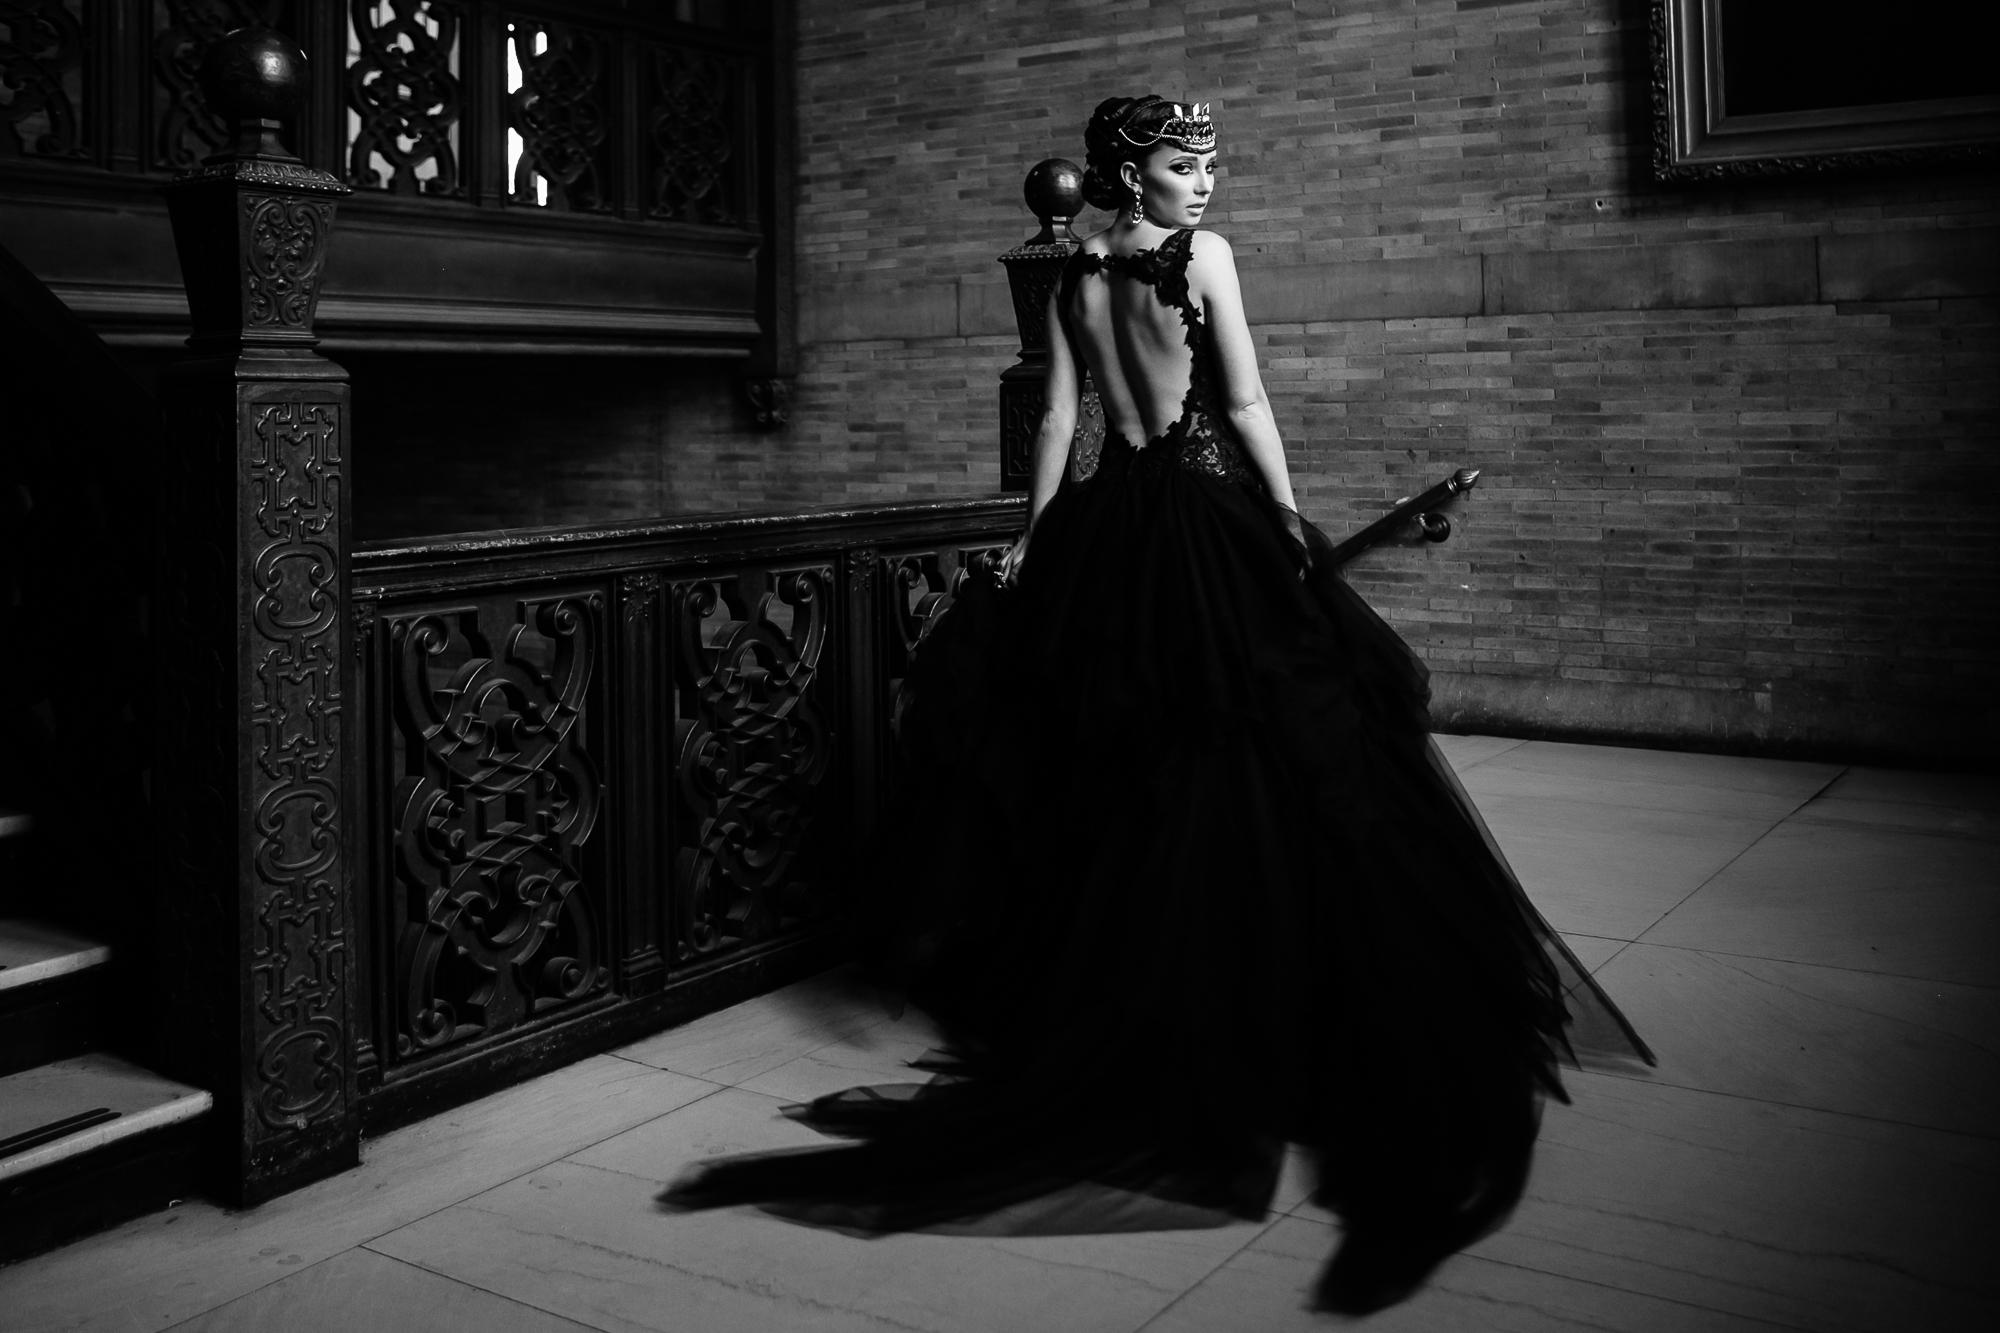 00 Black Lace Backless Wedding Dress Highline Hotel wedding Designer Aribella Events.jpg